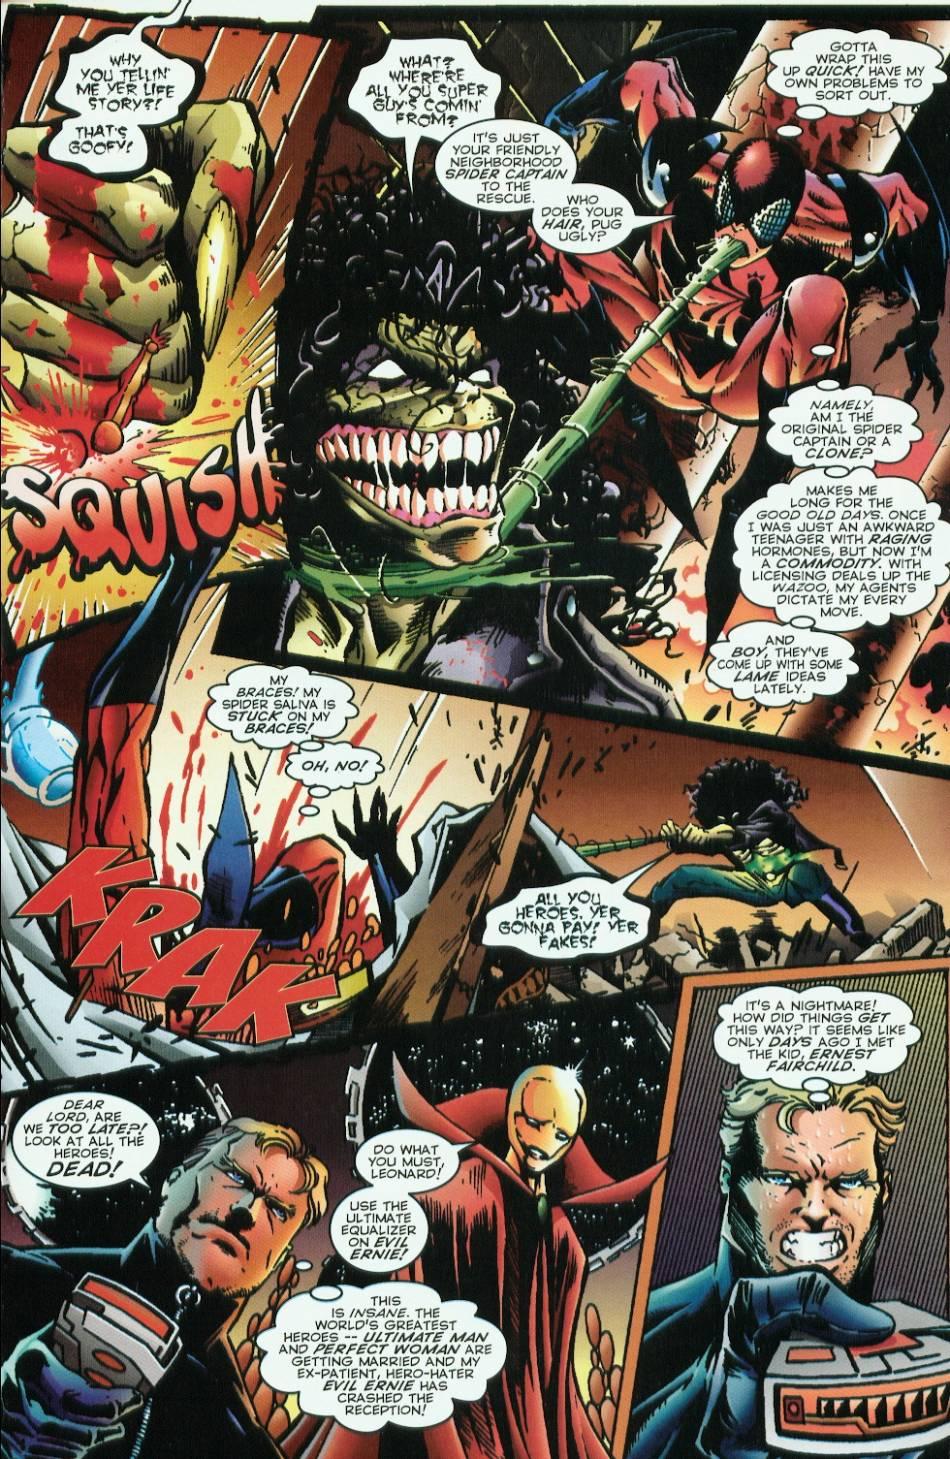 Read online Evil Ernie vs. the Superheroes comic -  Issue #1 - 5